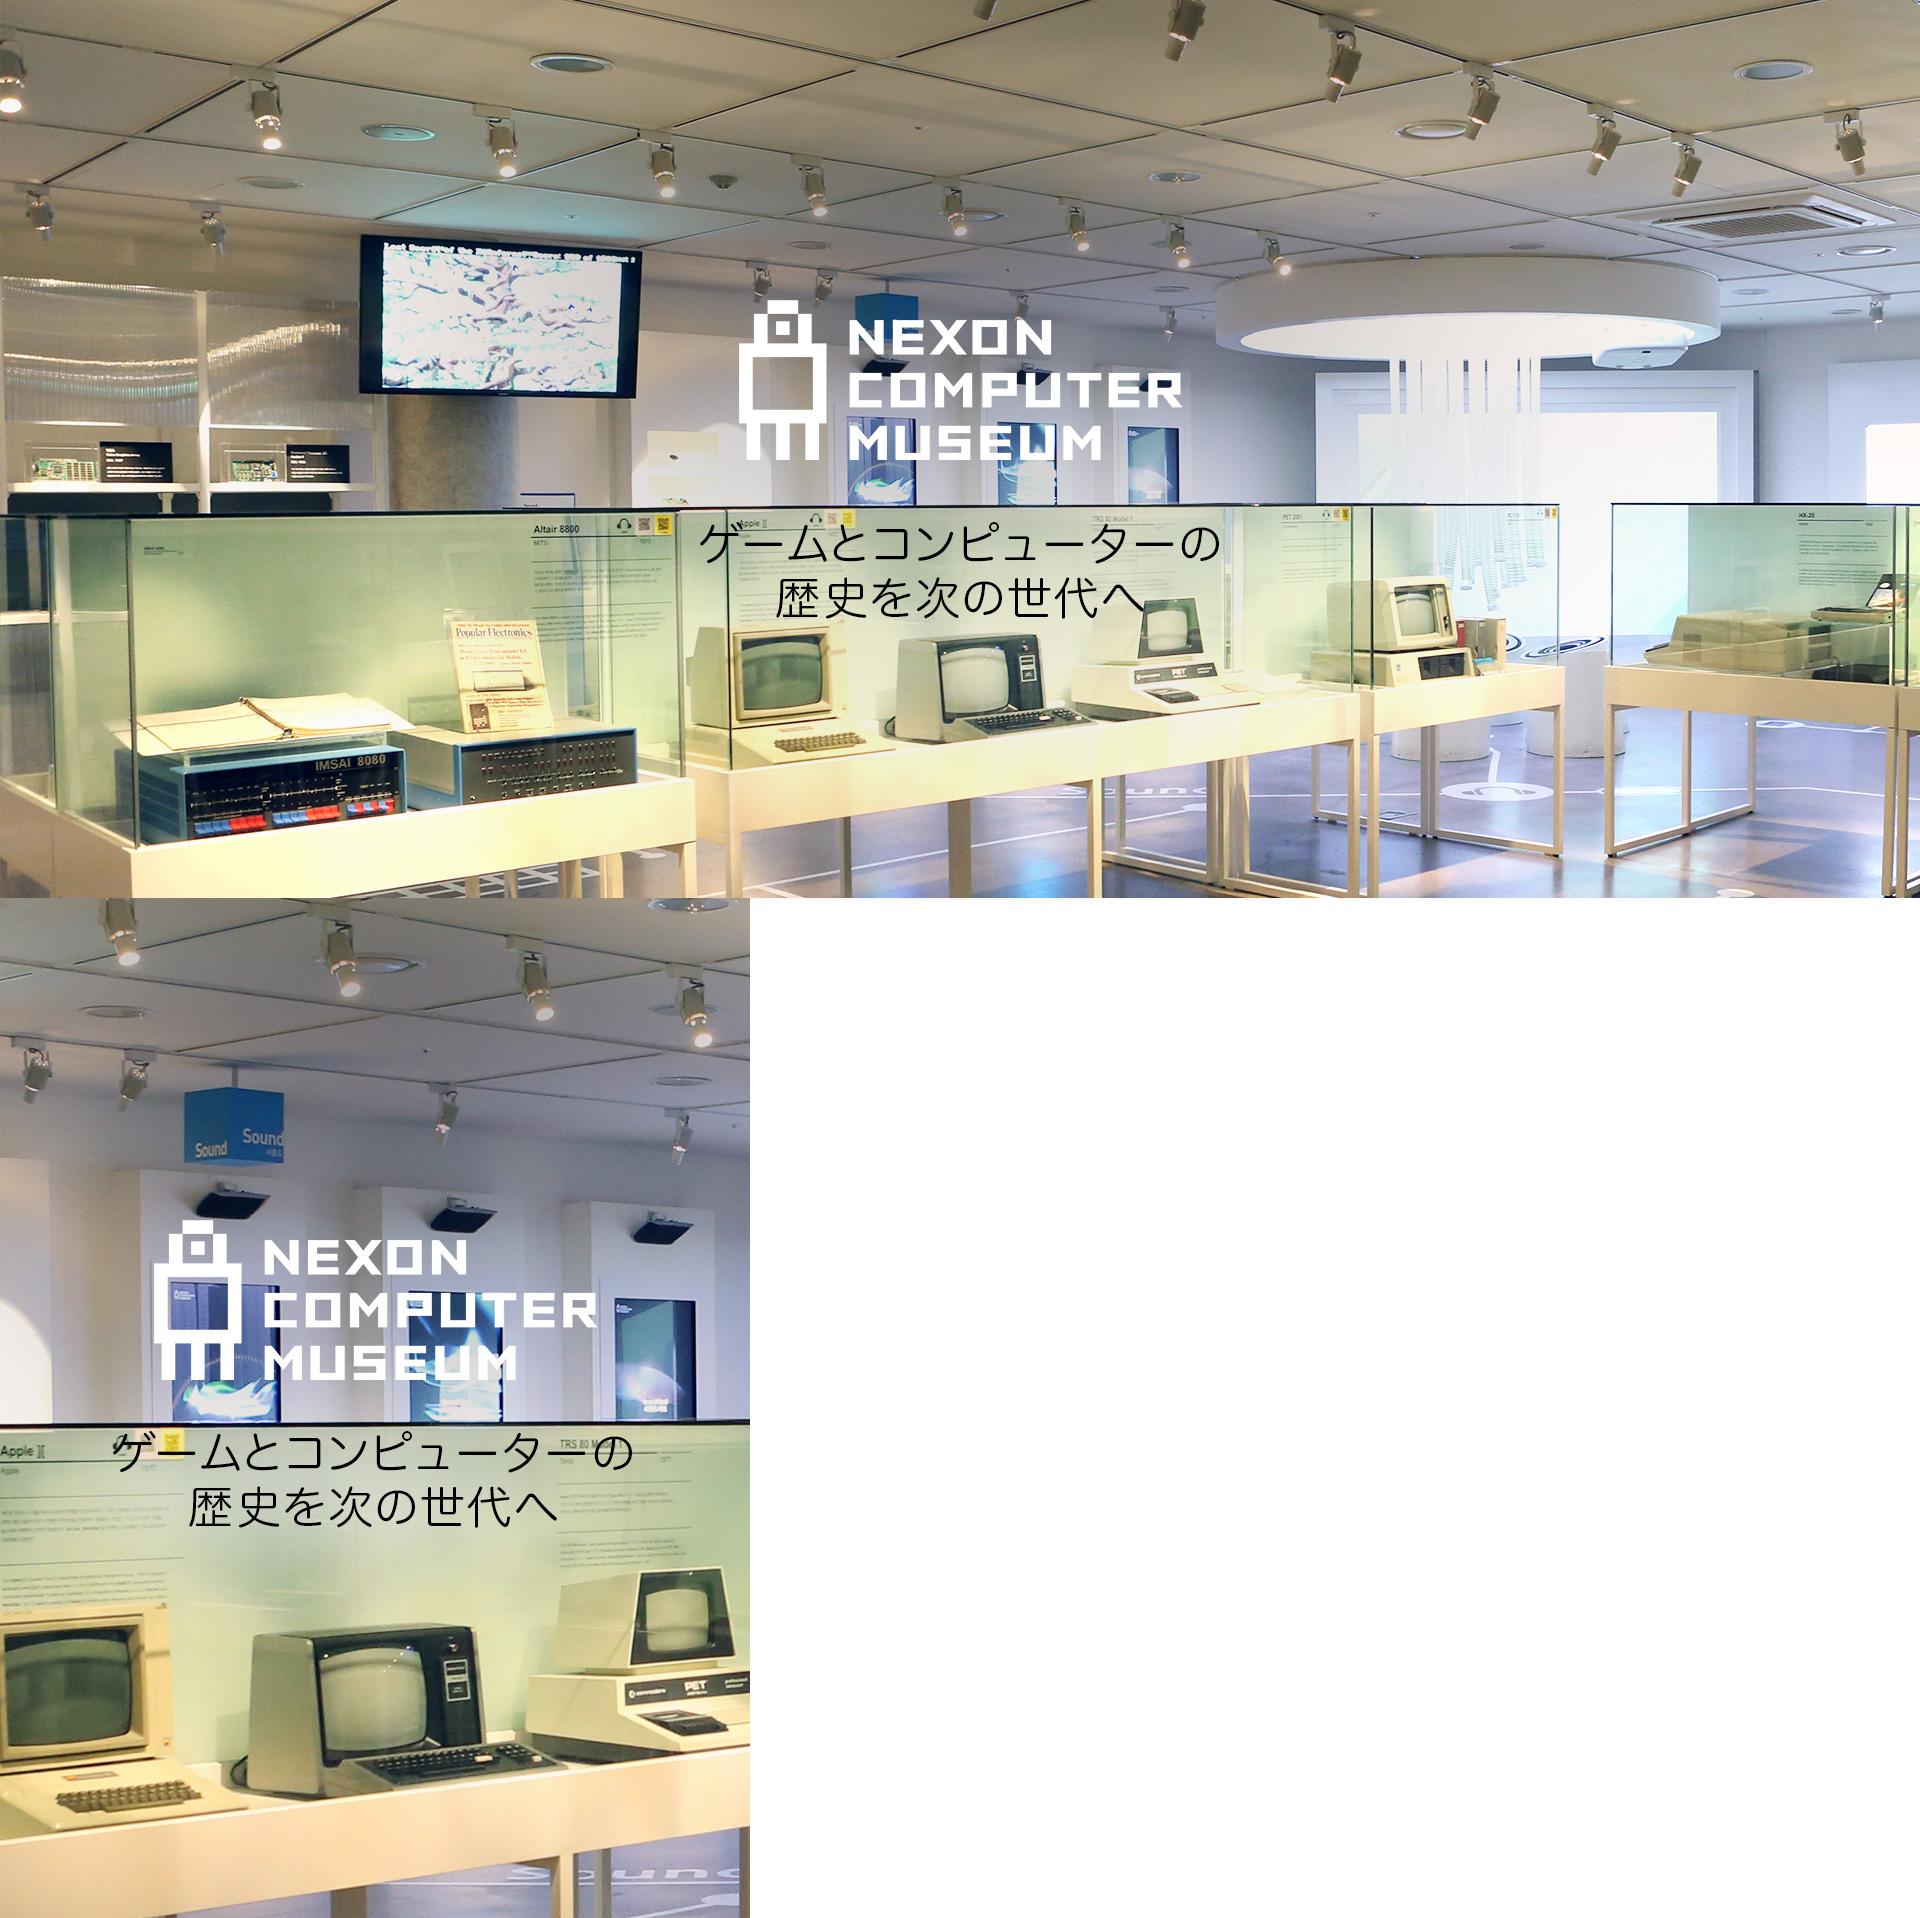 Nexon Computer Museum